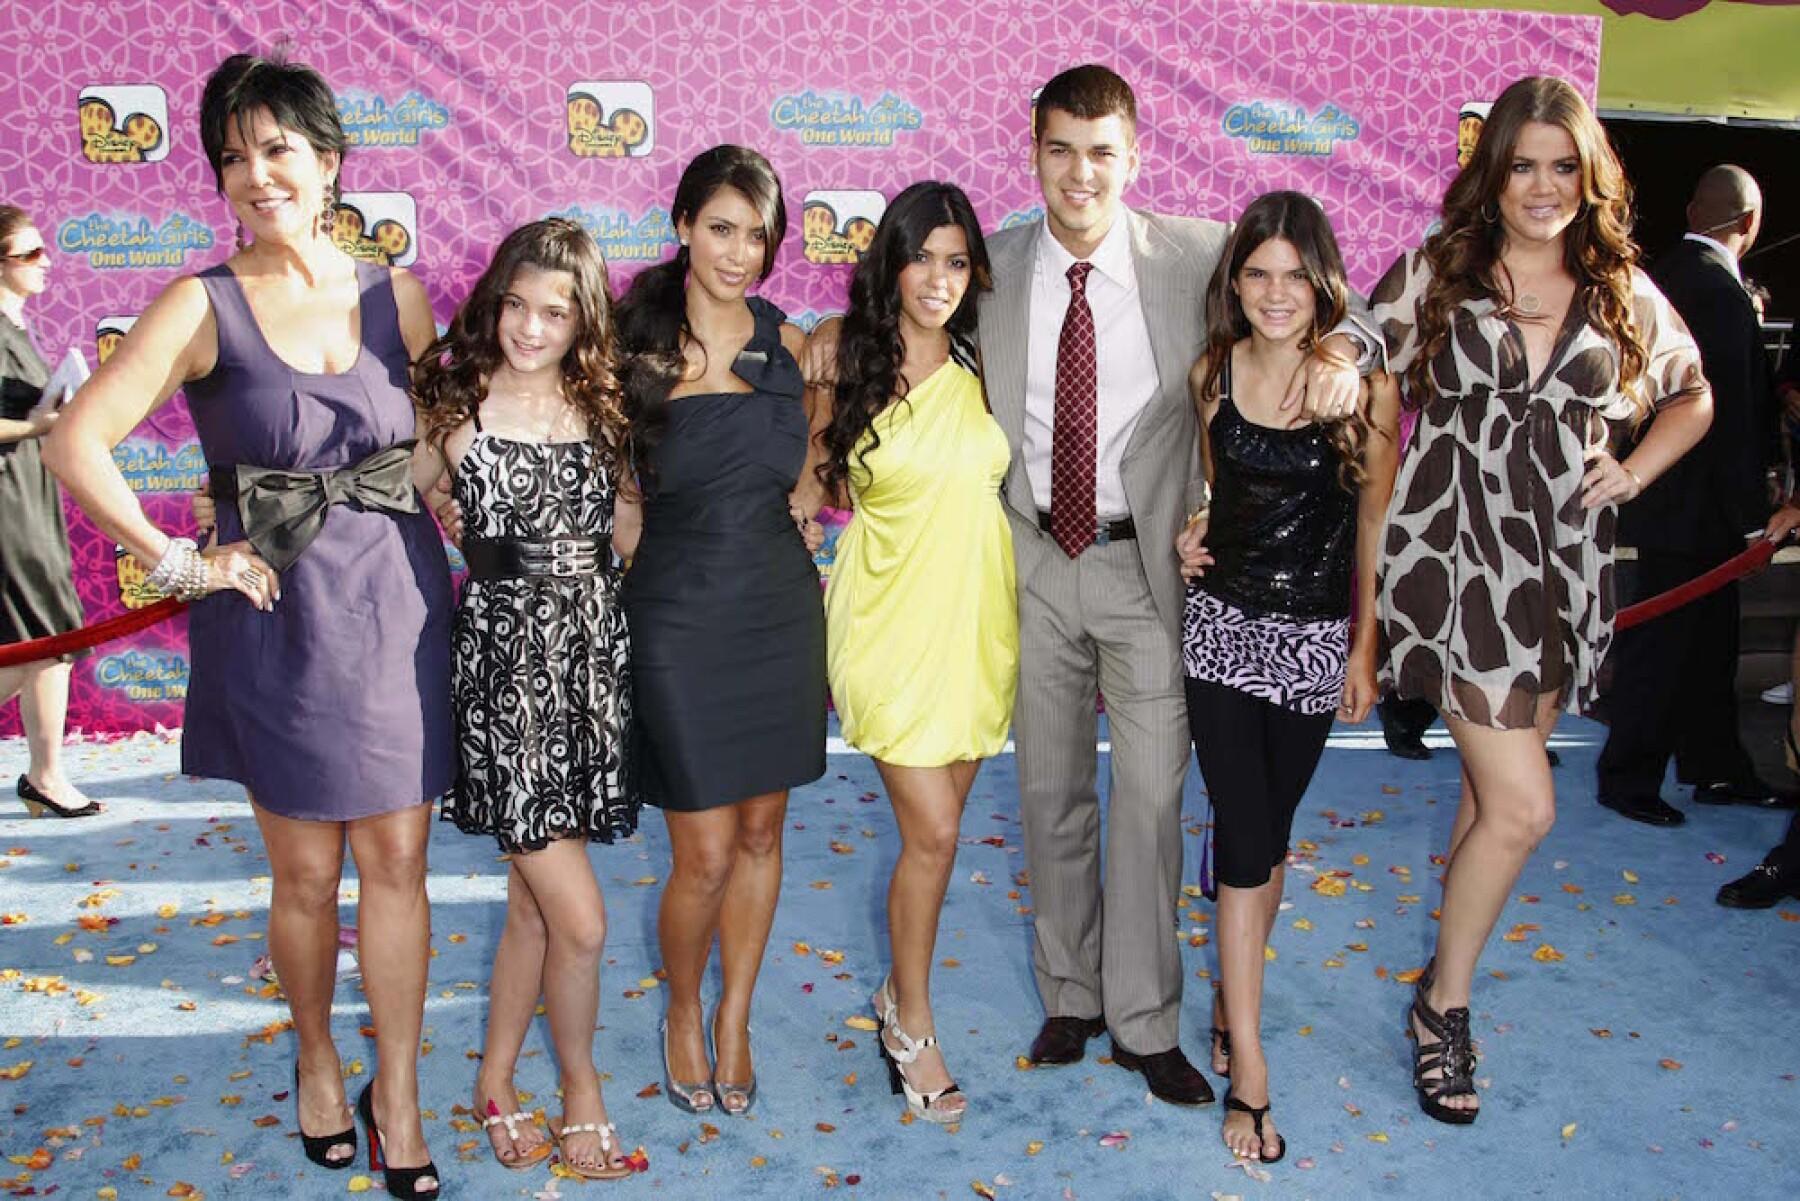 'The Cheetah Girls One World' Film Premiere, Los Angeles, America - 12 Aug 2008